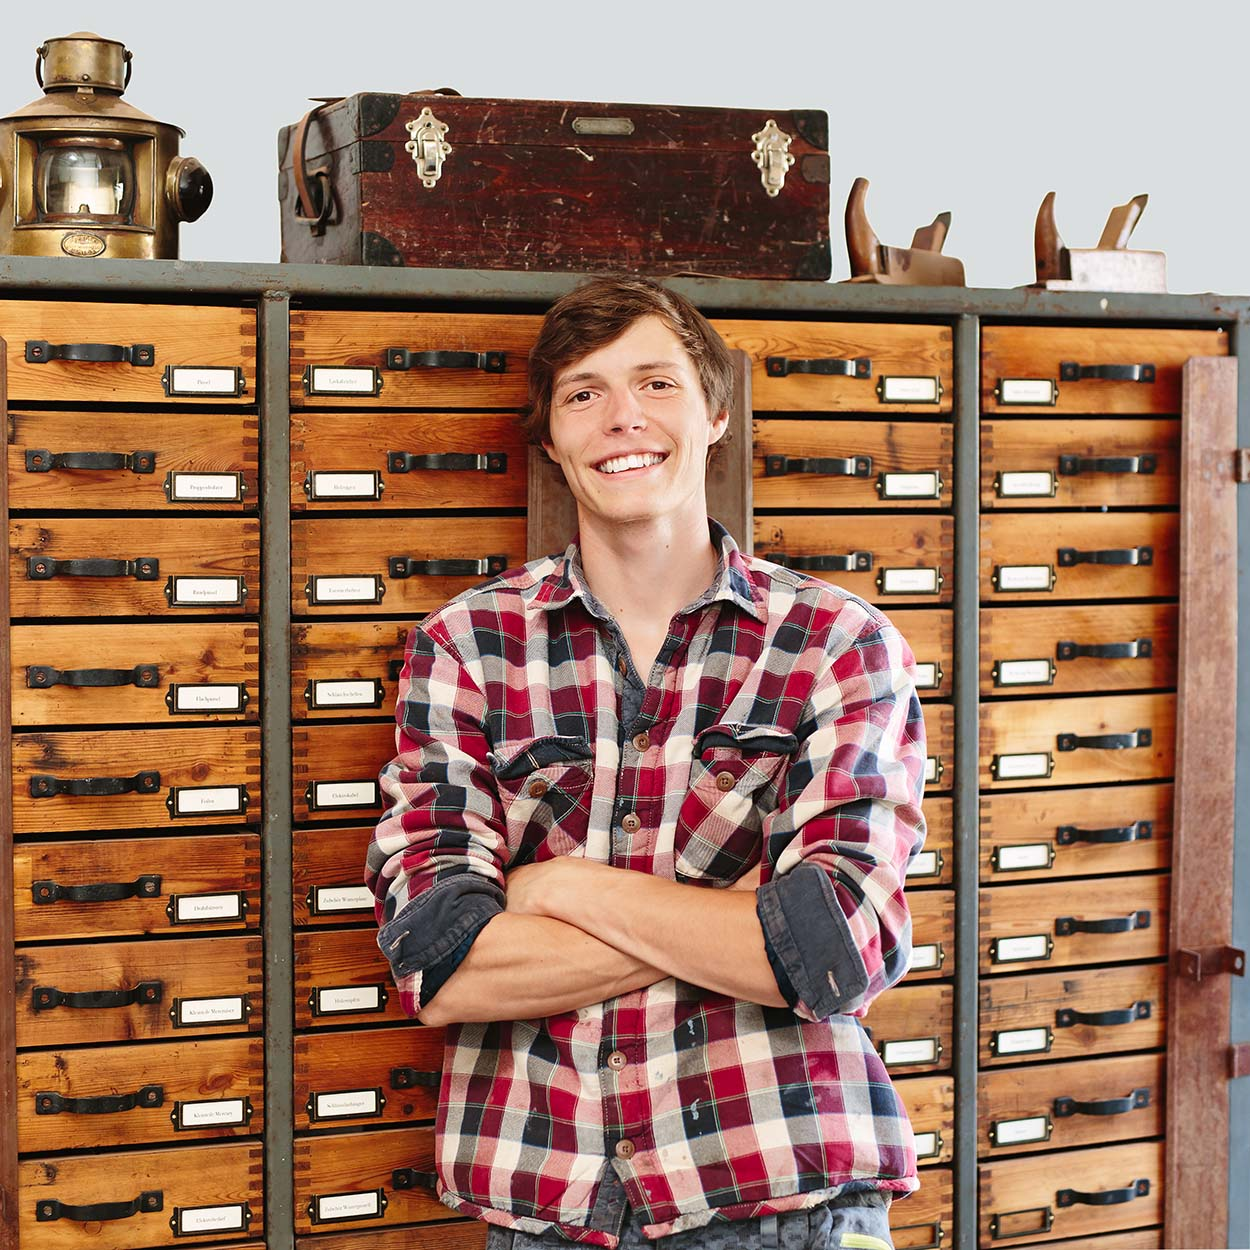 Bootsbaumeister-Julien-Norman-Melke-Norman-Bootsbau-Potsdam-Havel-Causalux-Fotografie